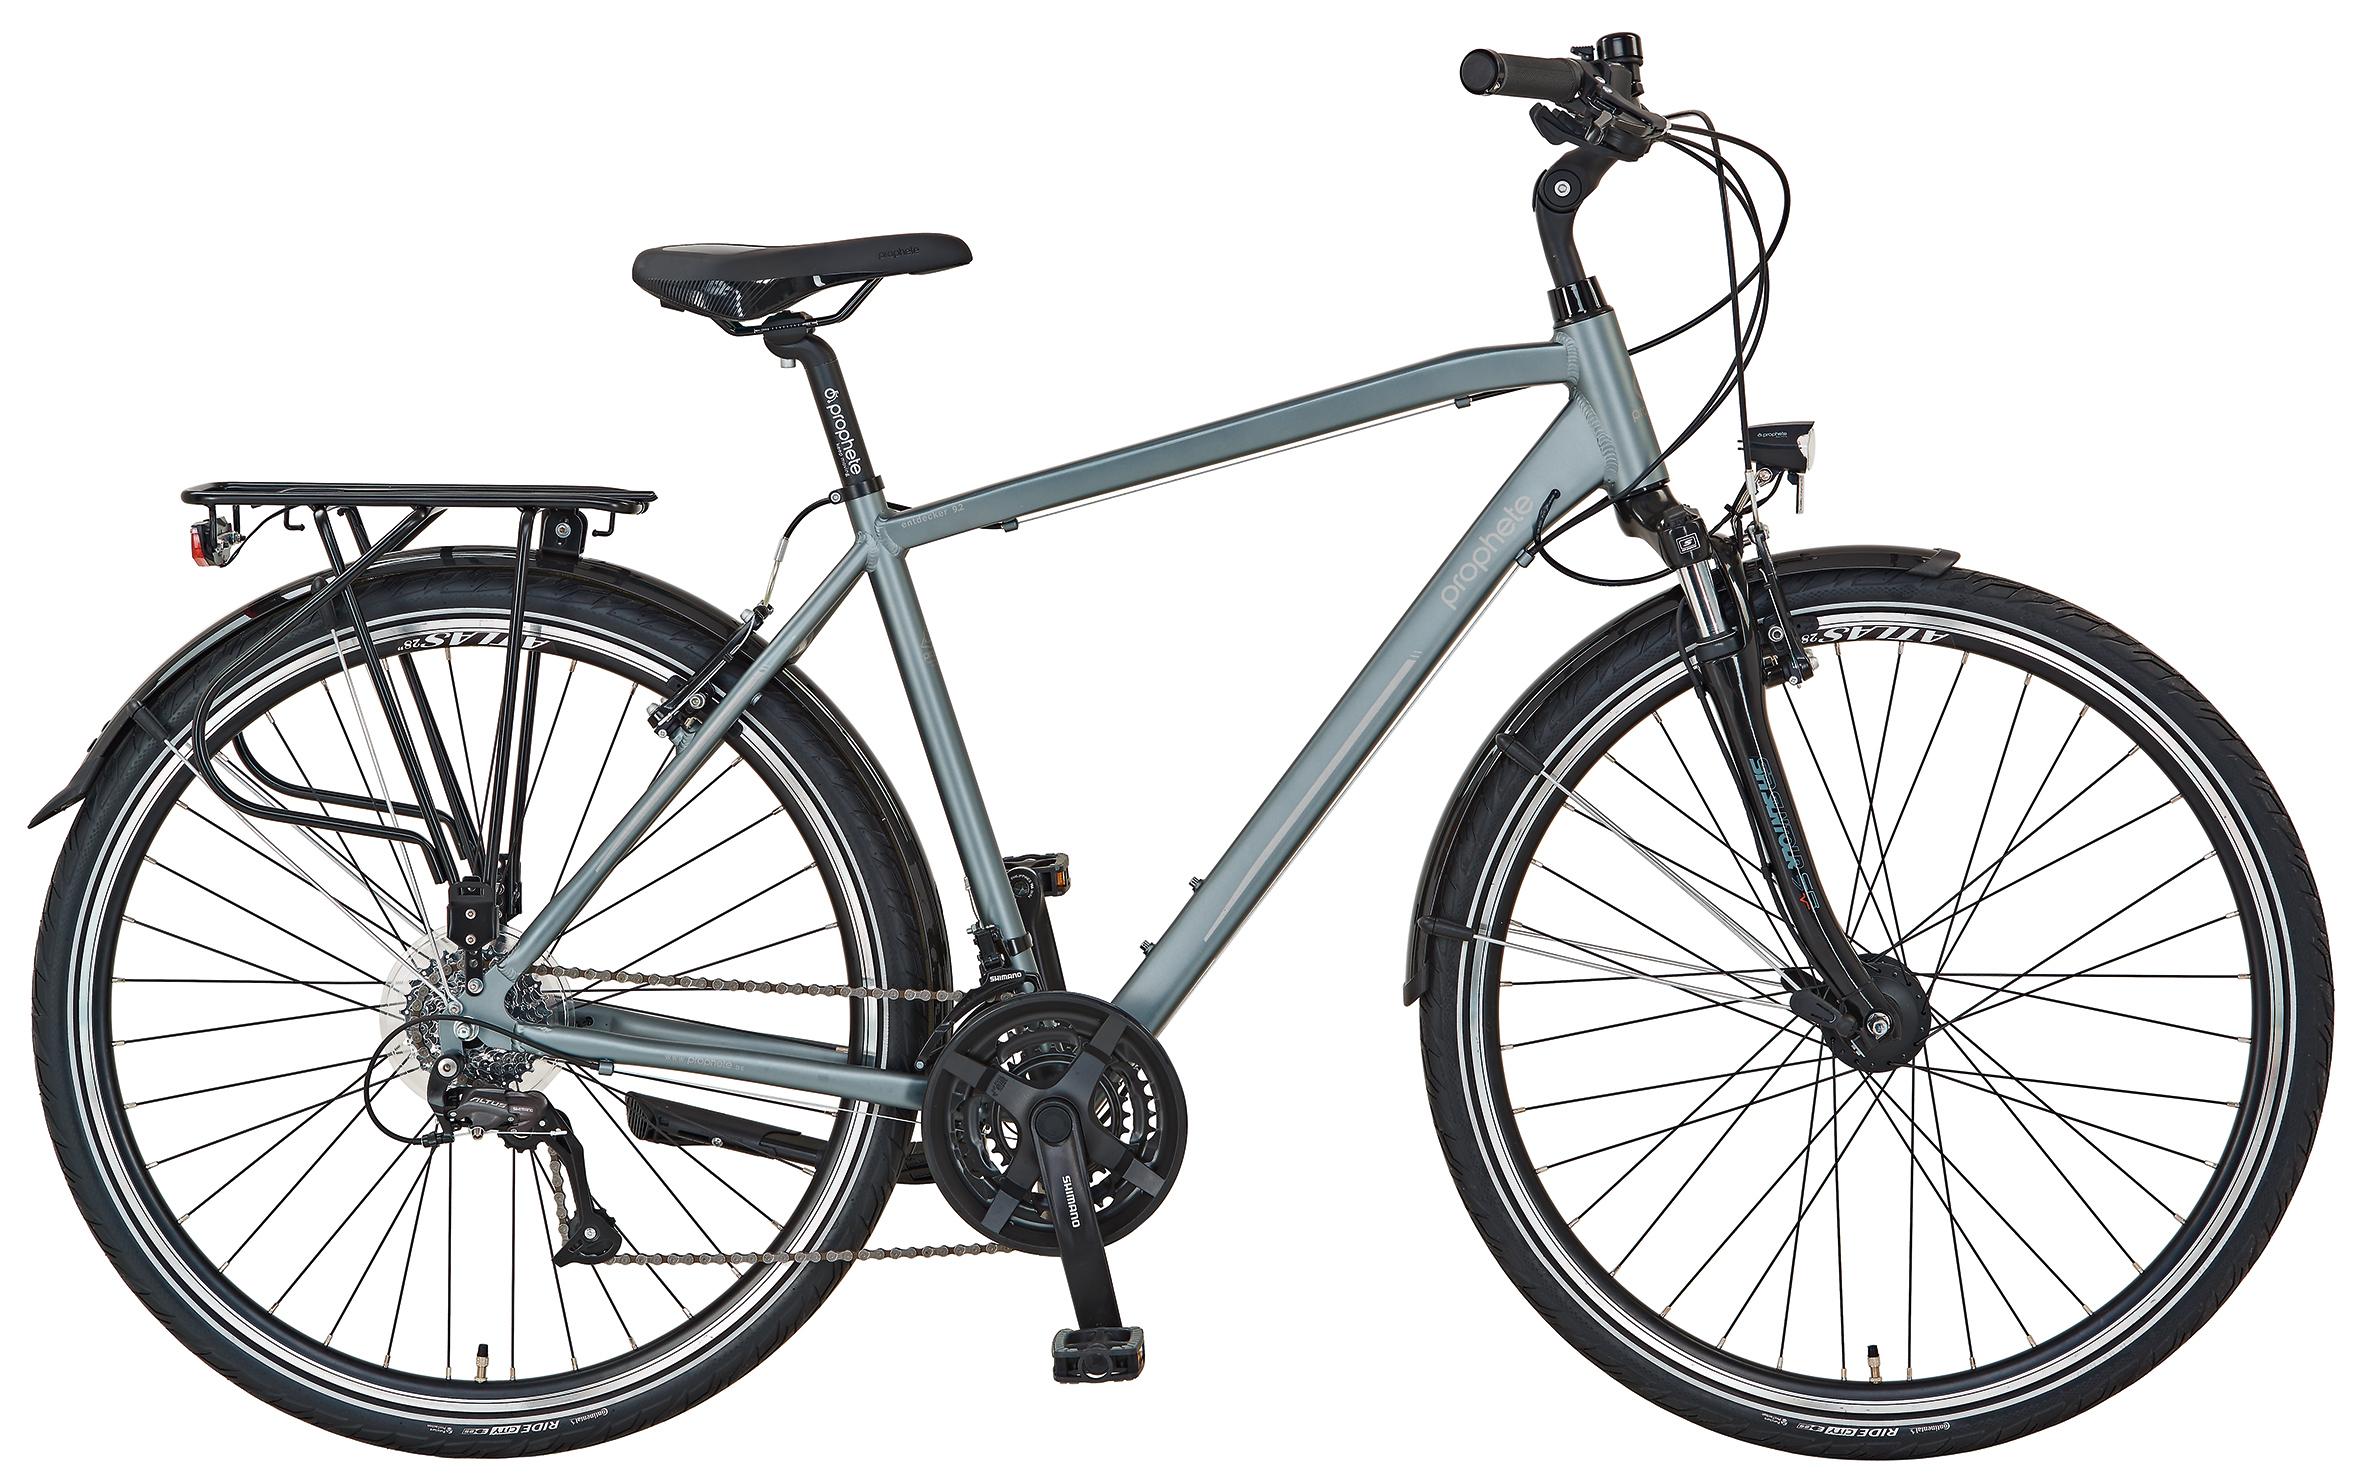 "Prophete Fahrrad / Trekkingrad Entdecker 9.2 Trekking Bike 28"" Herren Bild 1"